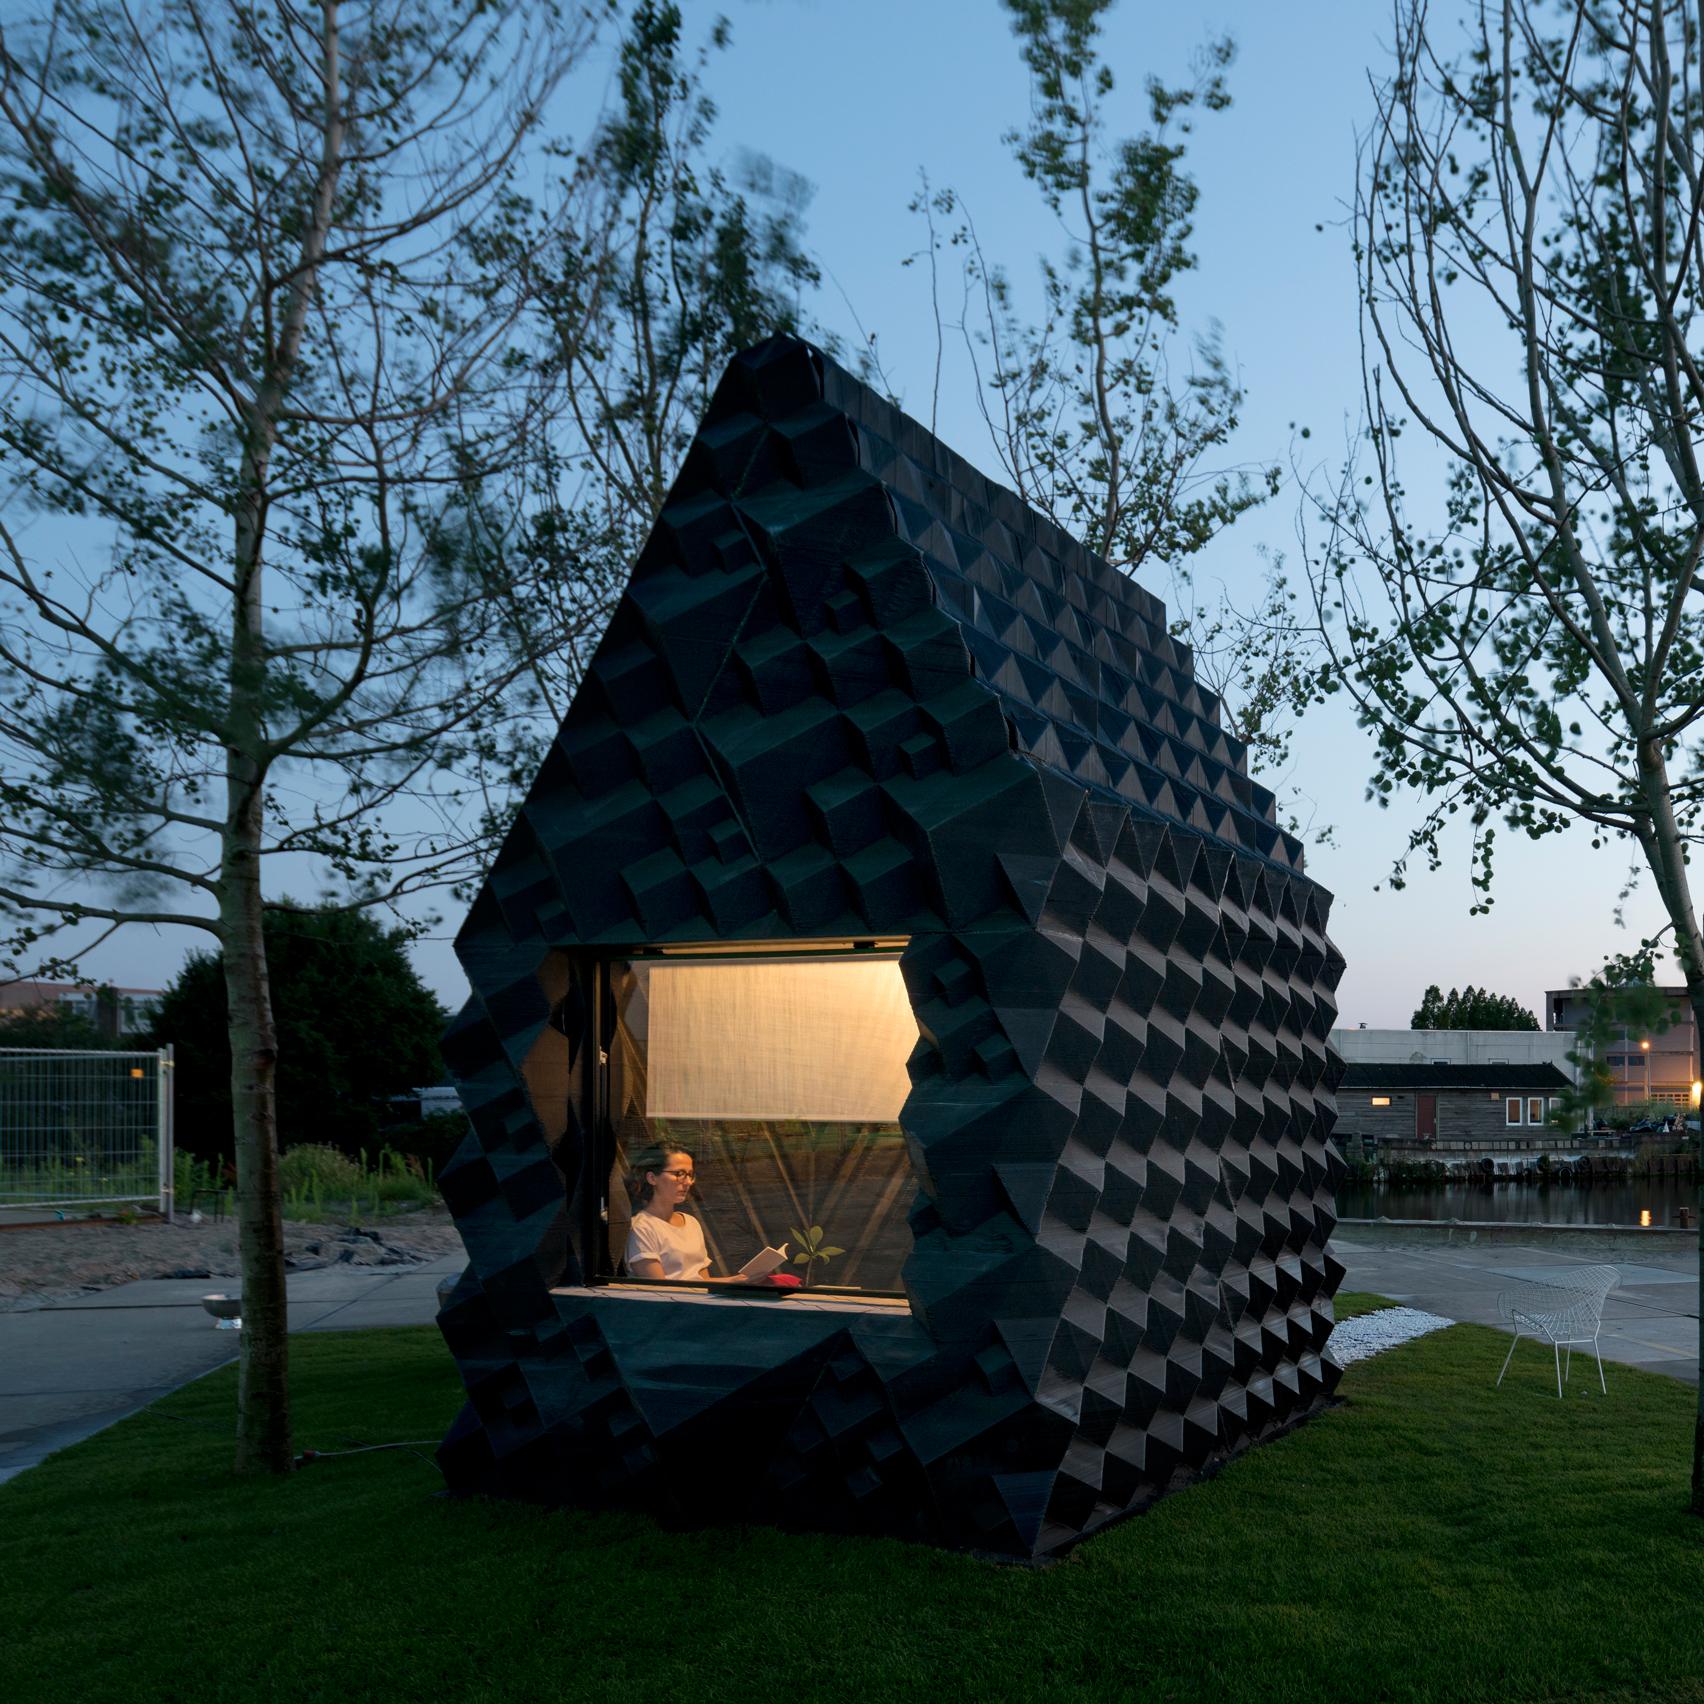 3d-print-urban-cabin-dus-architects-micro-homes-roundups_dezeen_sq.jpg